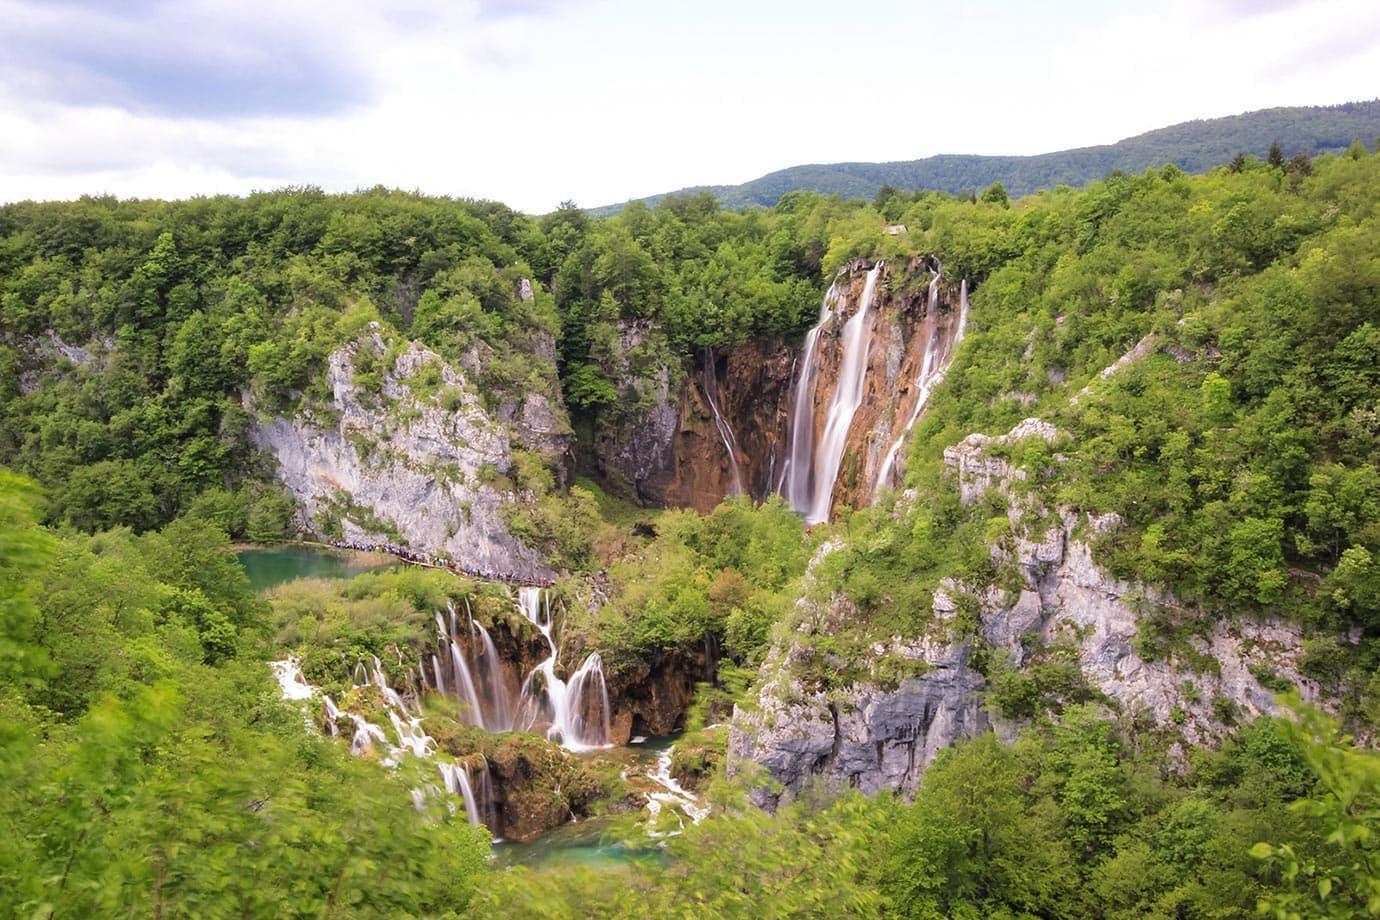 View of Plitvice Lakes National Park, Croatia